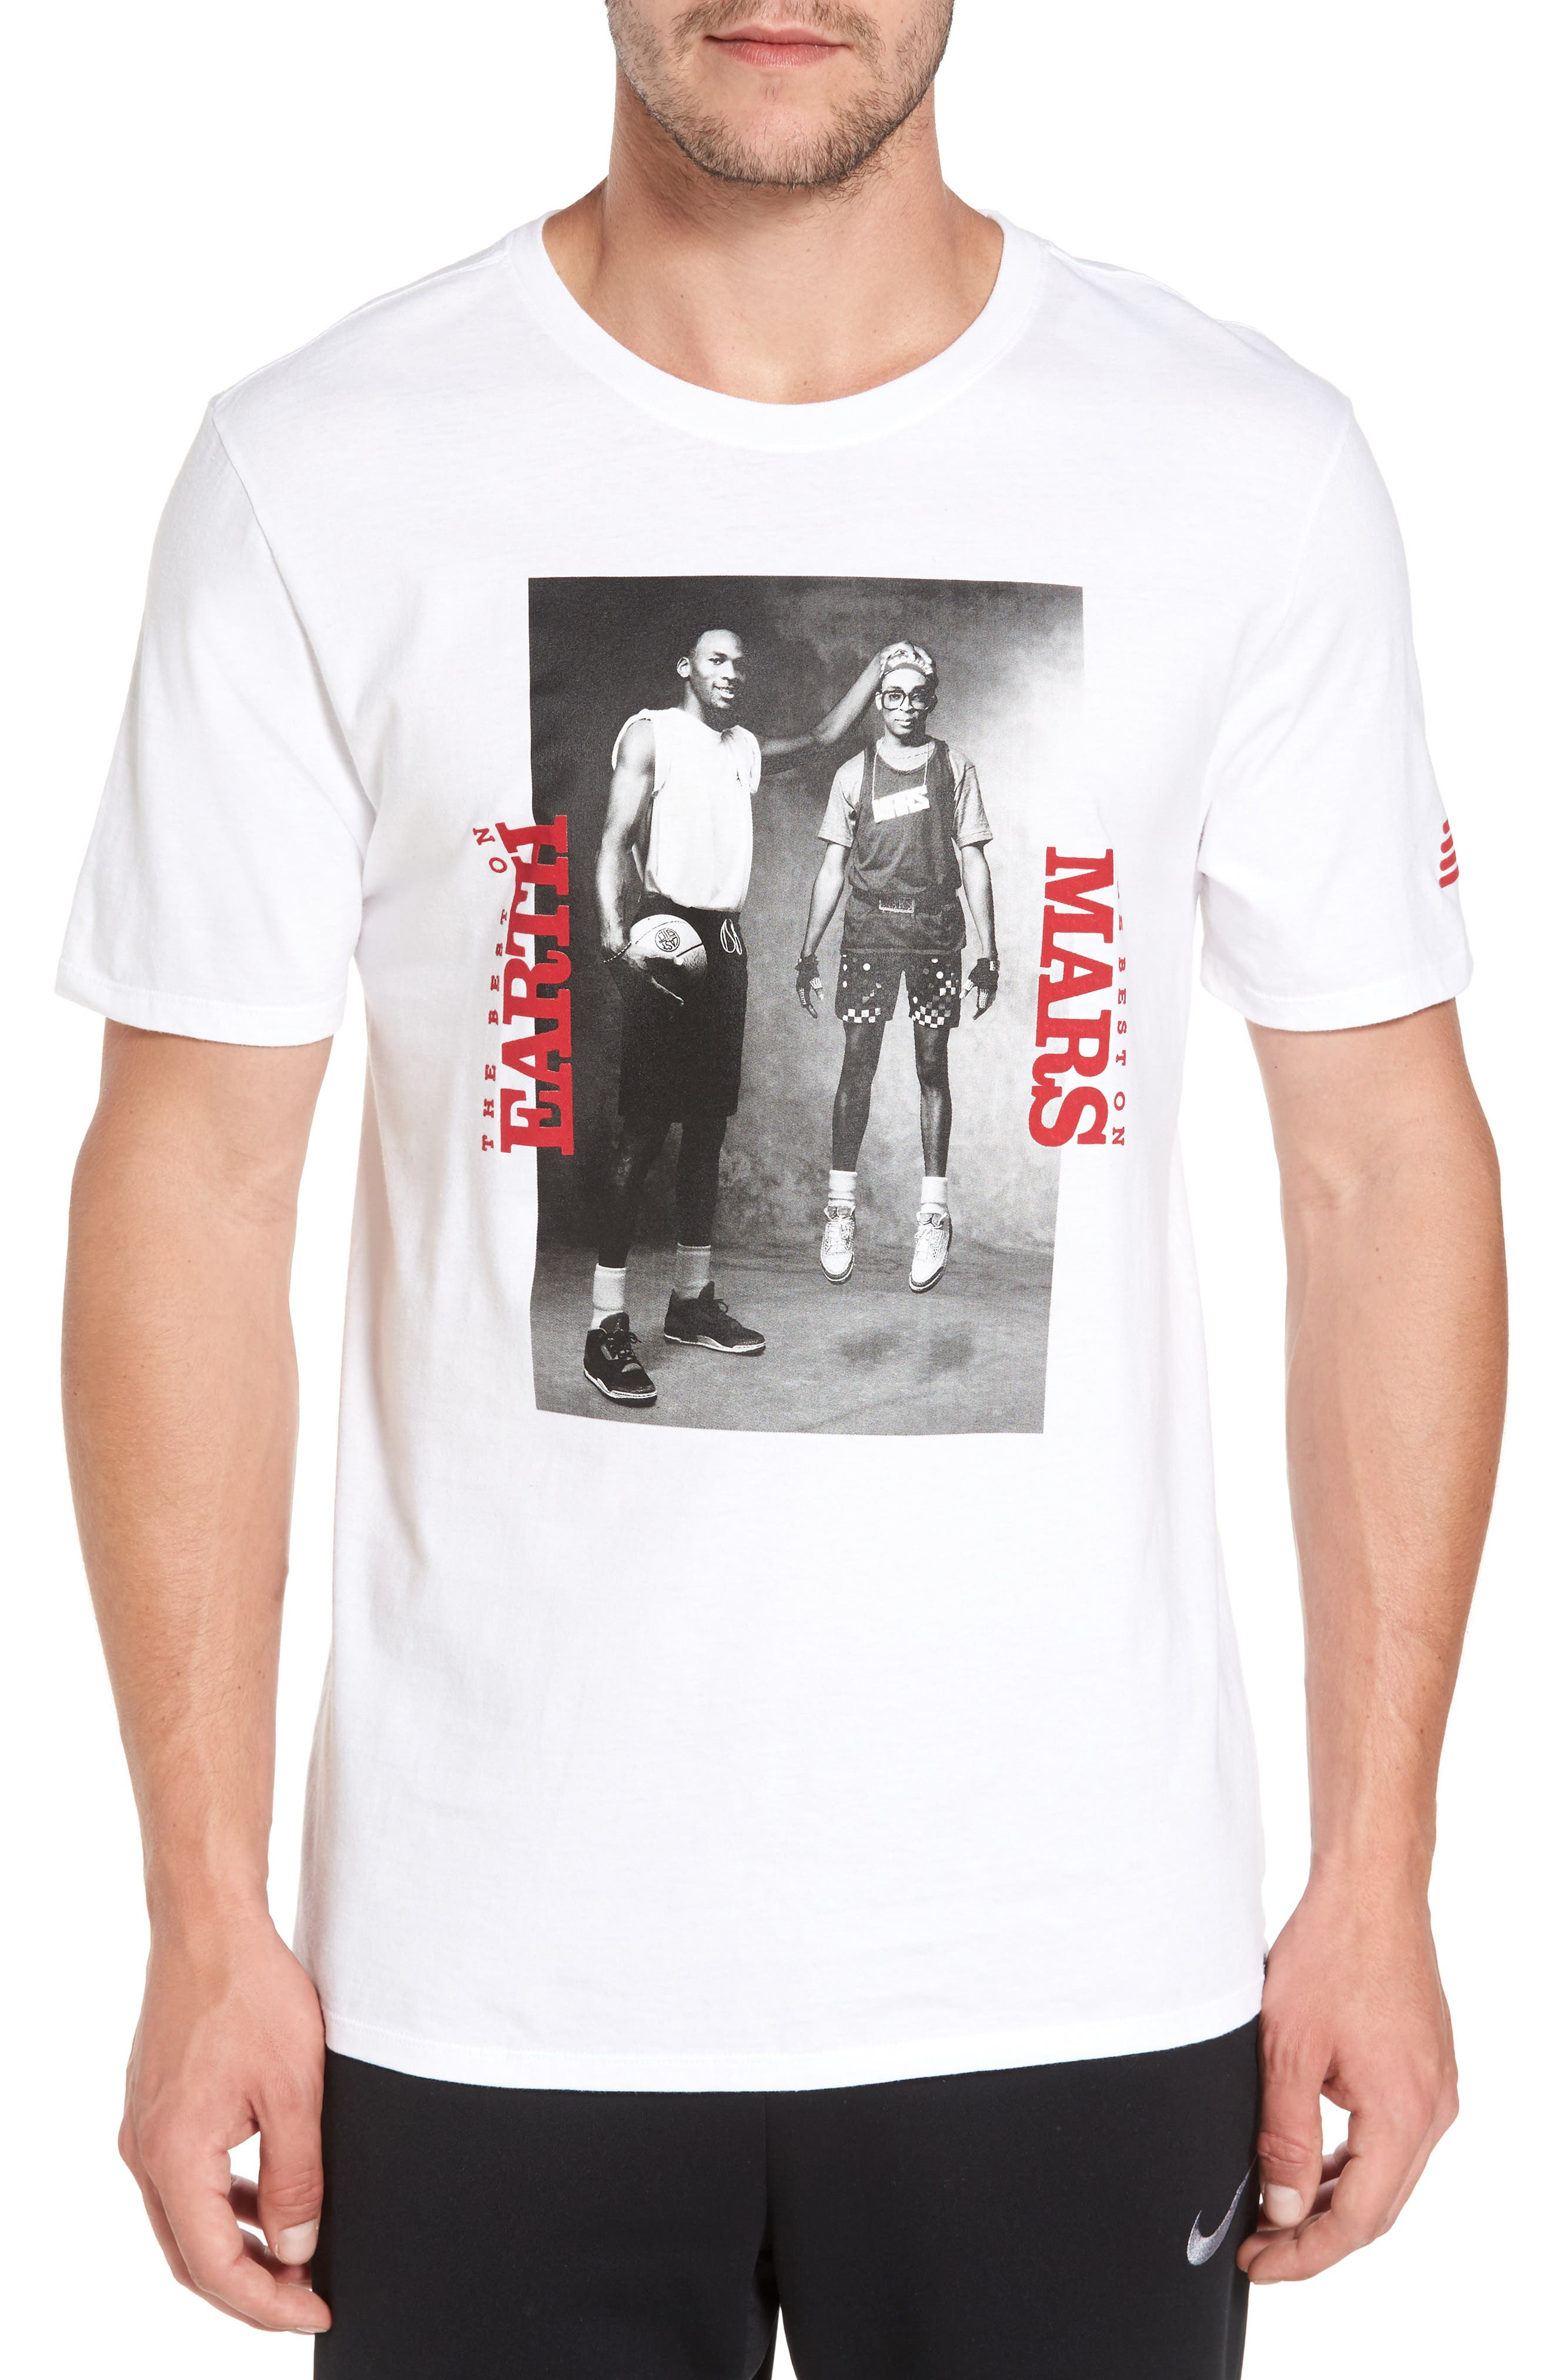 Nike Jordan Sportswear Mars Blackmon T-Shirt, White